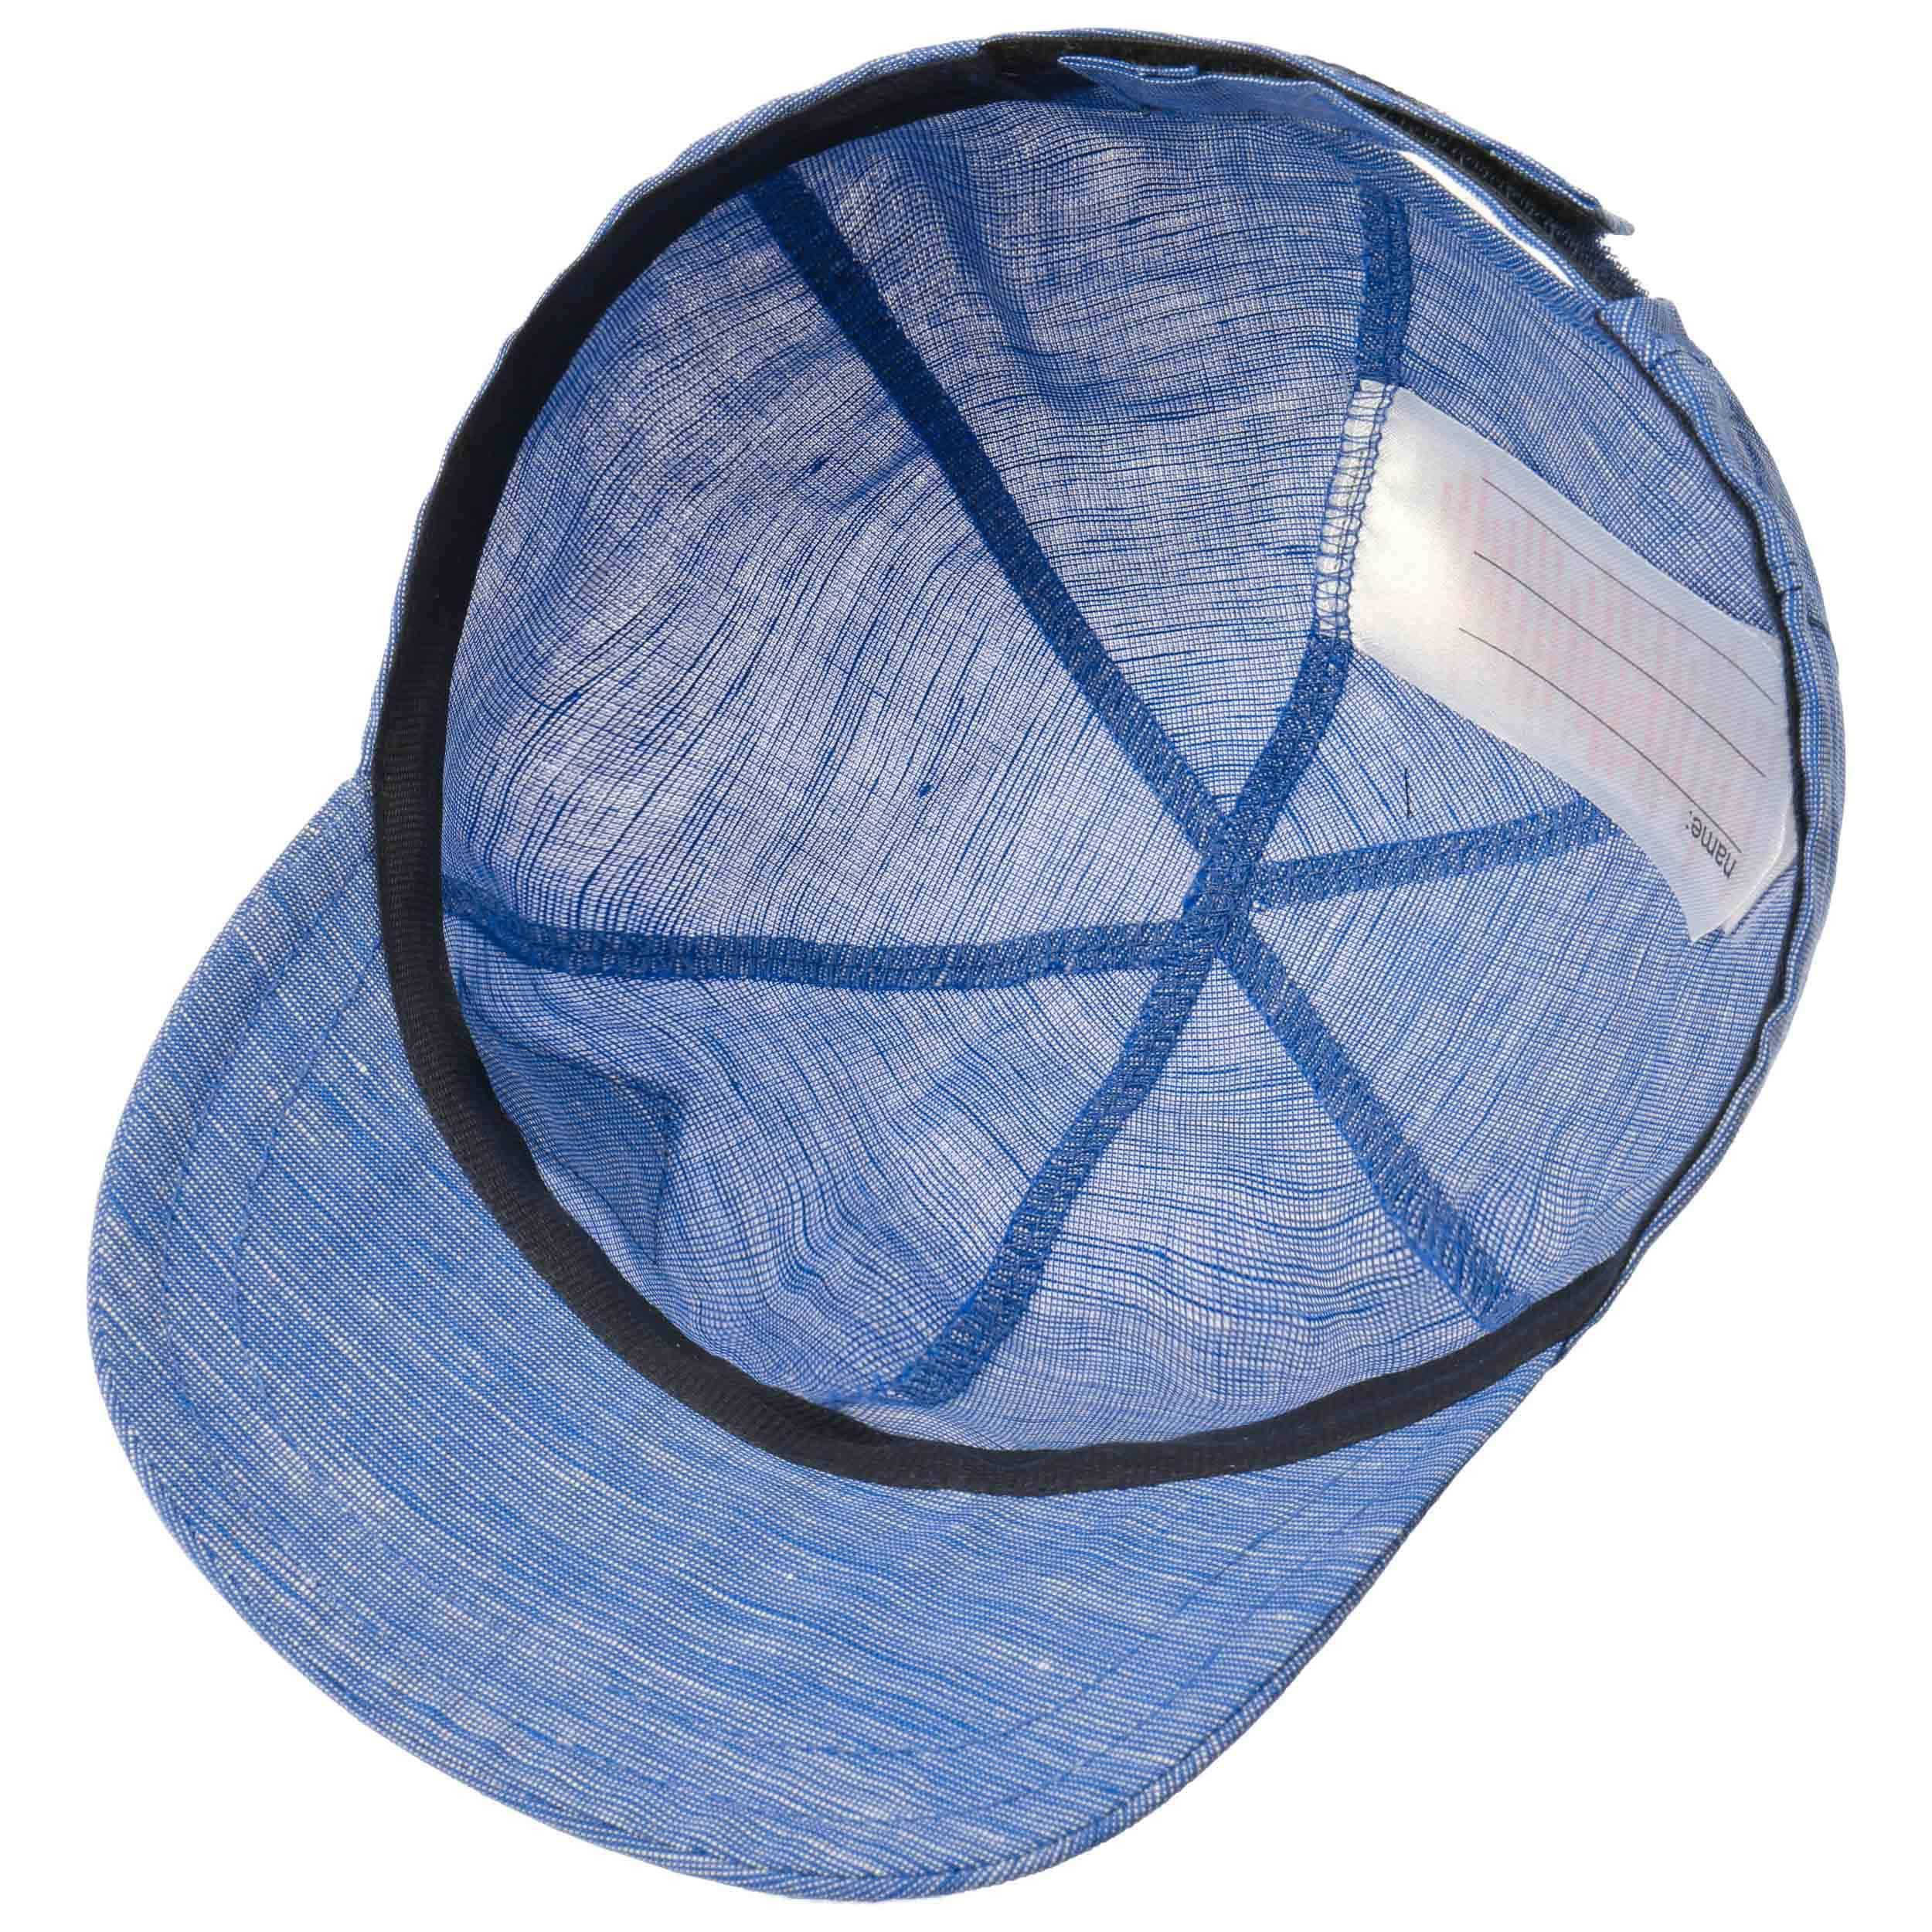 Döll Baseball Bonnet Bébé Garçon Jeans Casquette bleu Baseball Cap Coton Protection UV